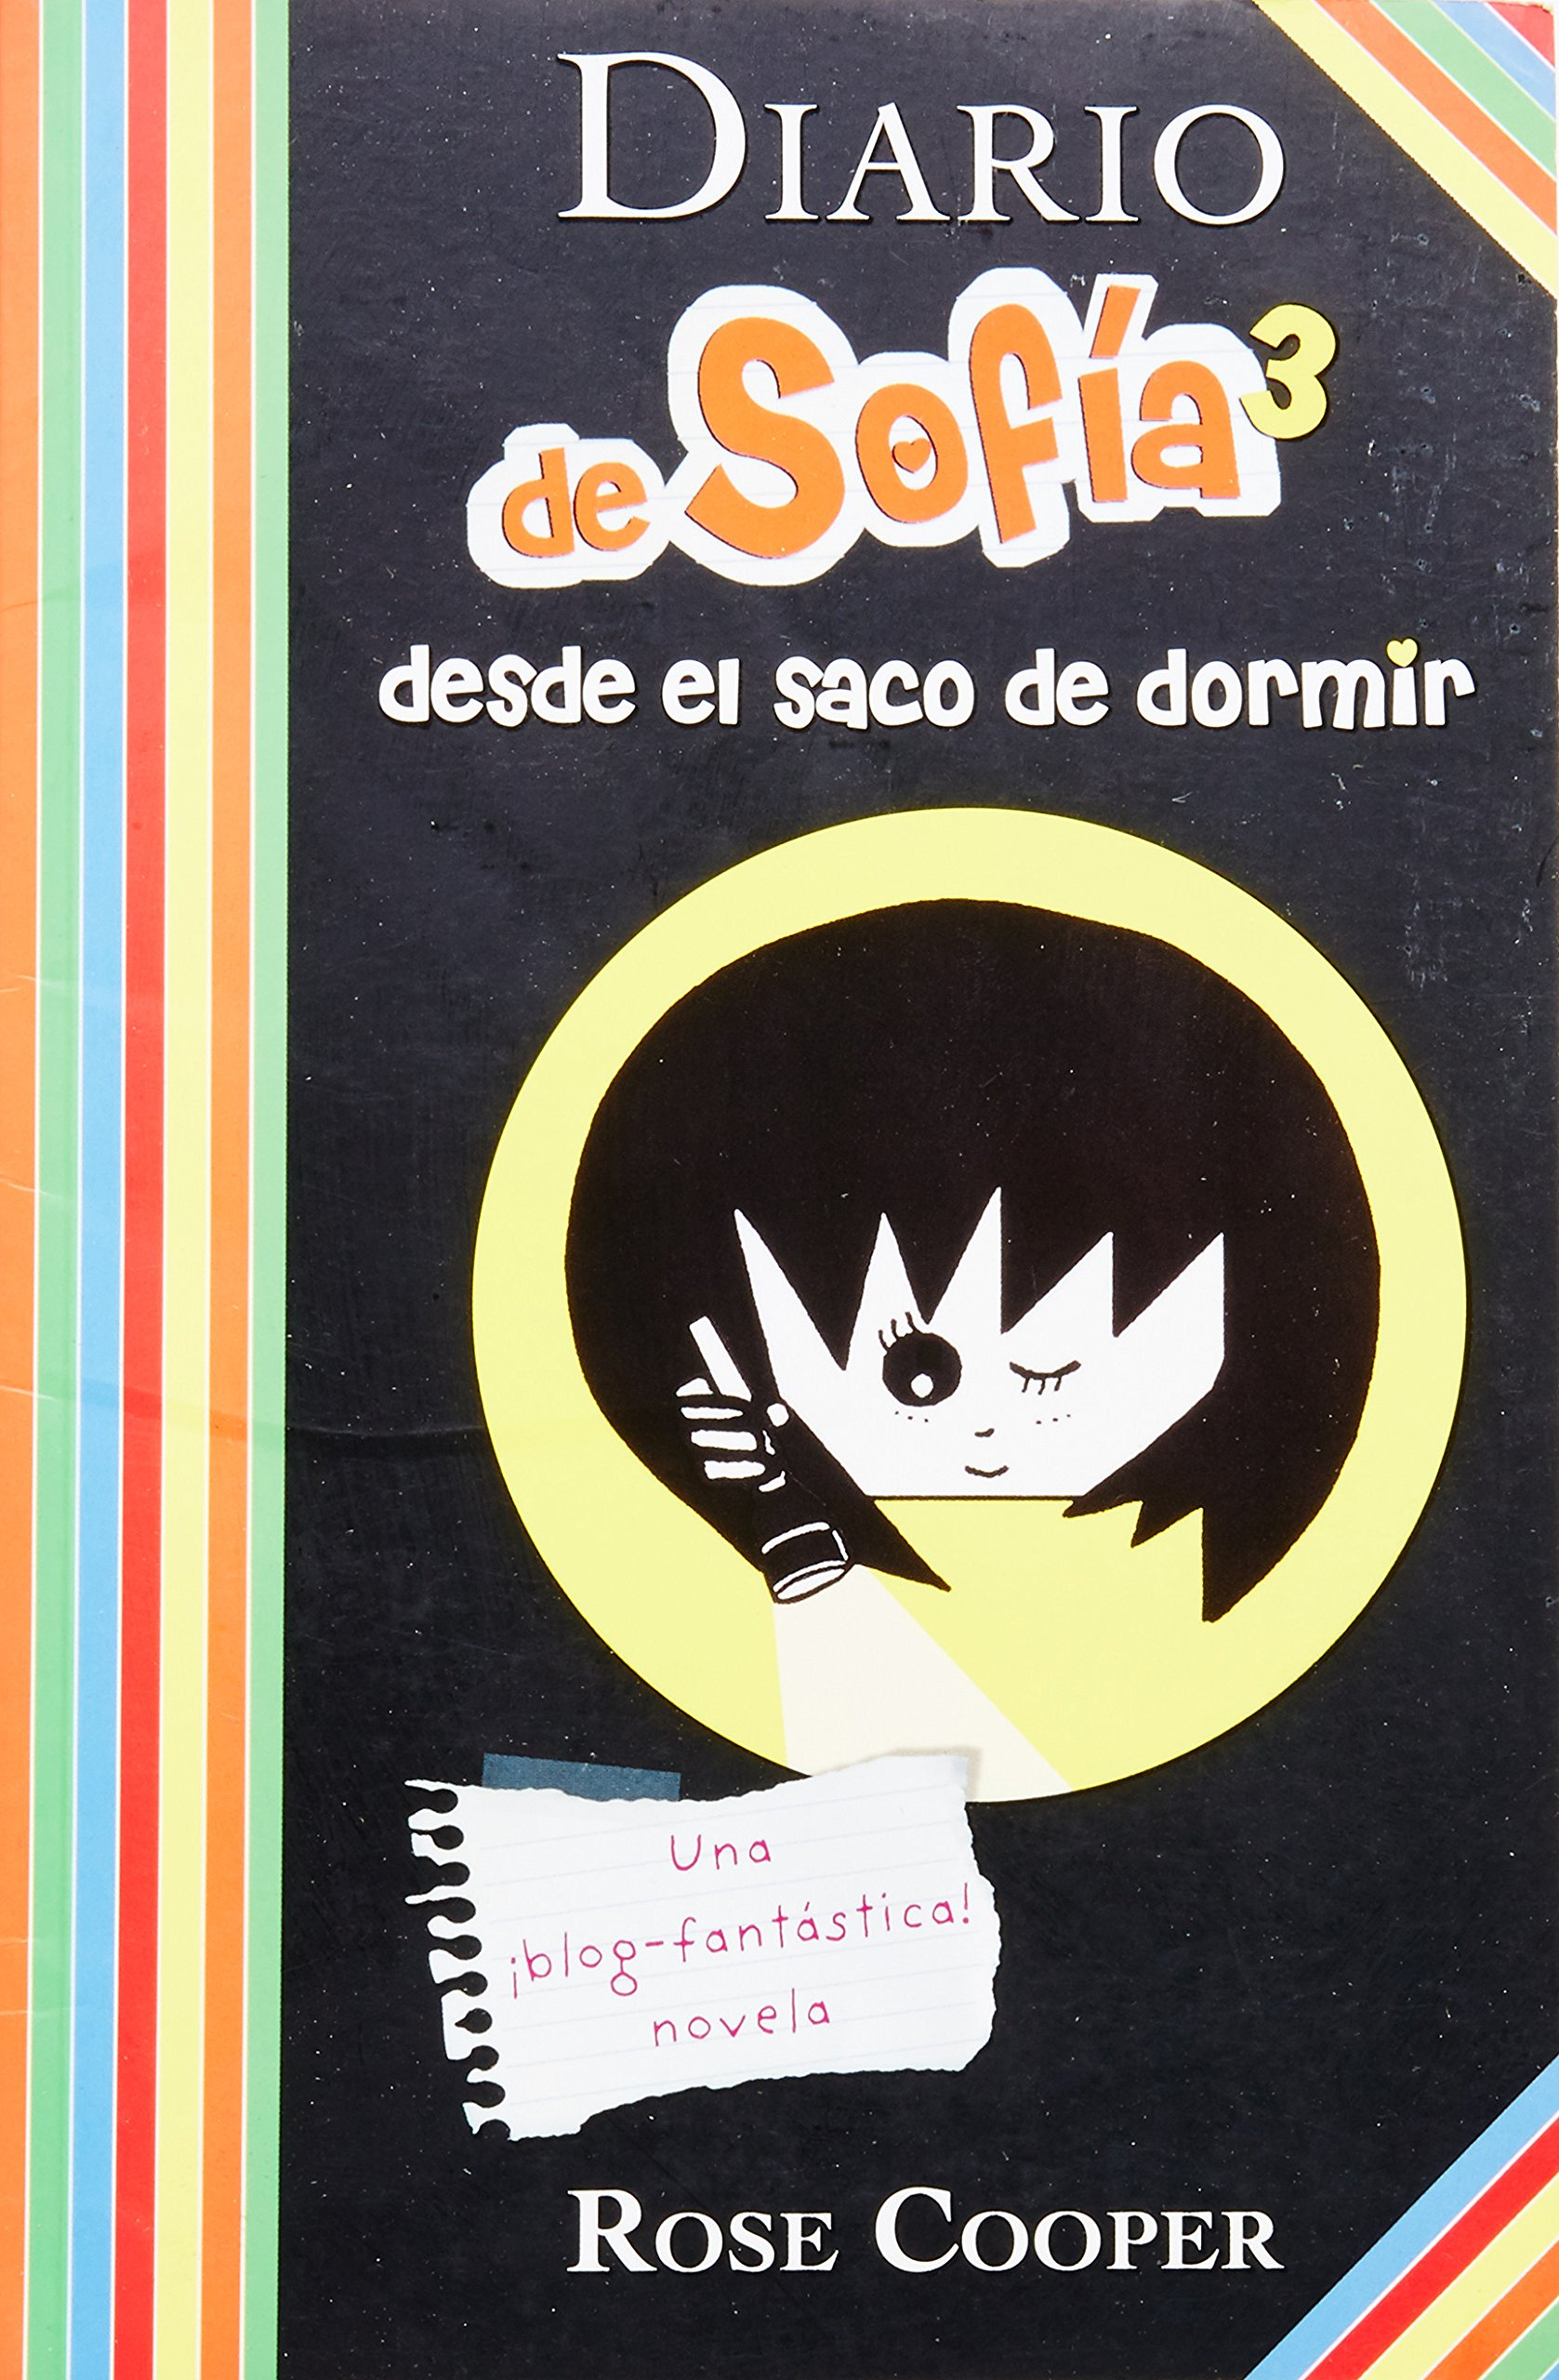 Diario de Sofía 3 (Spanish) Paperback – 2013